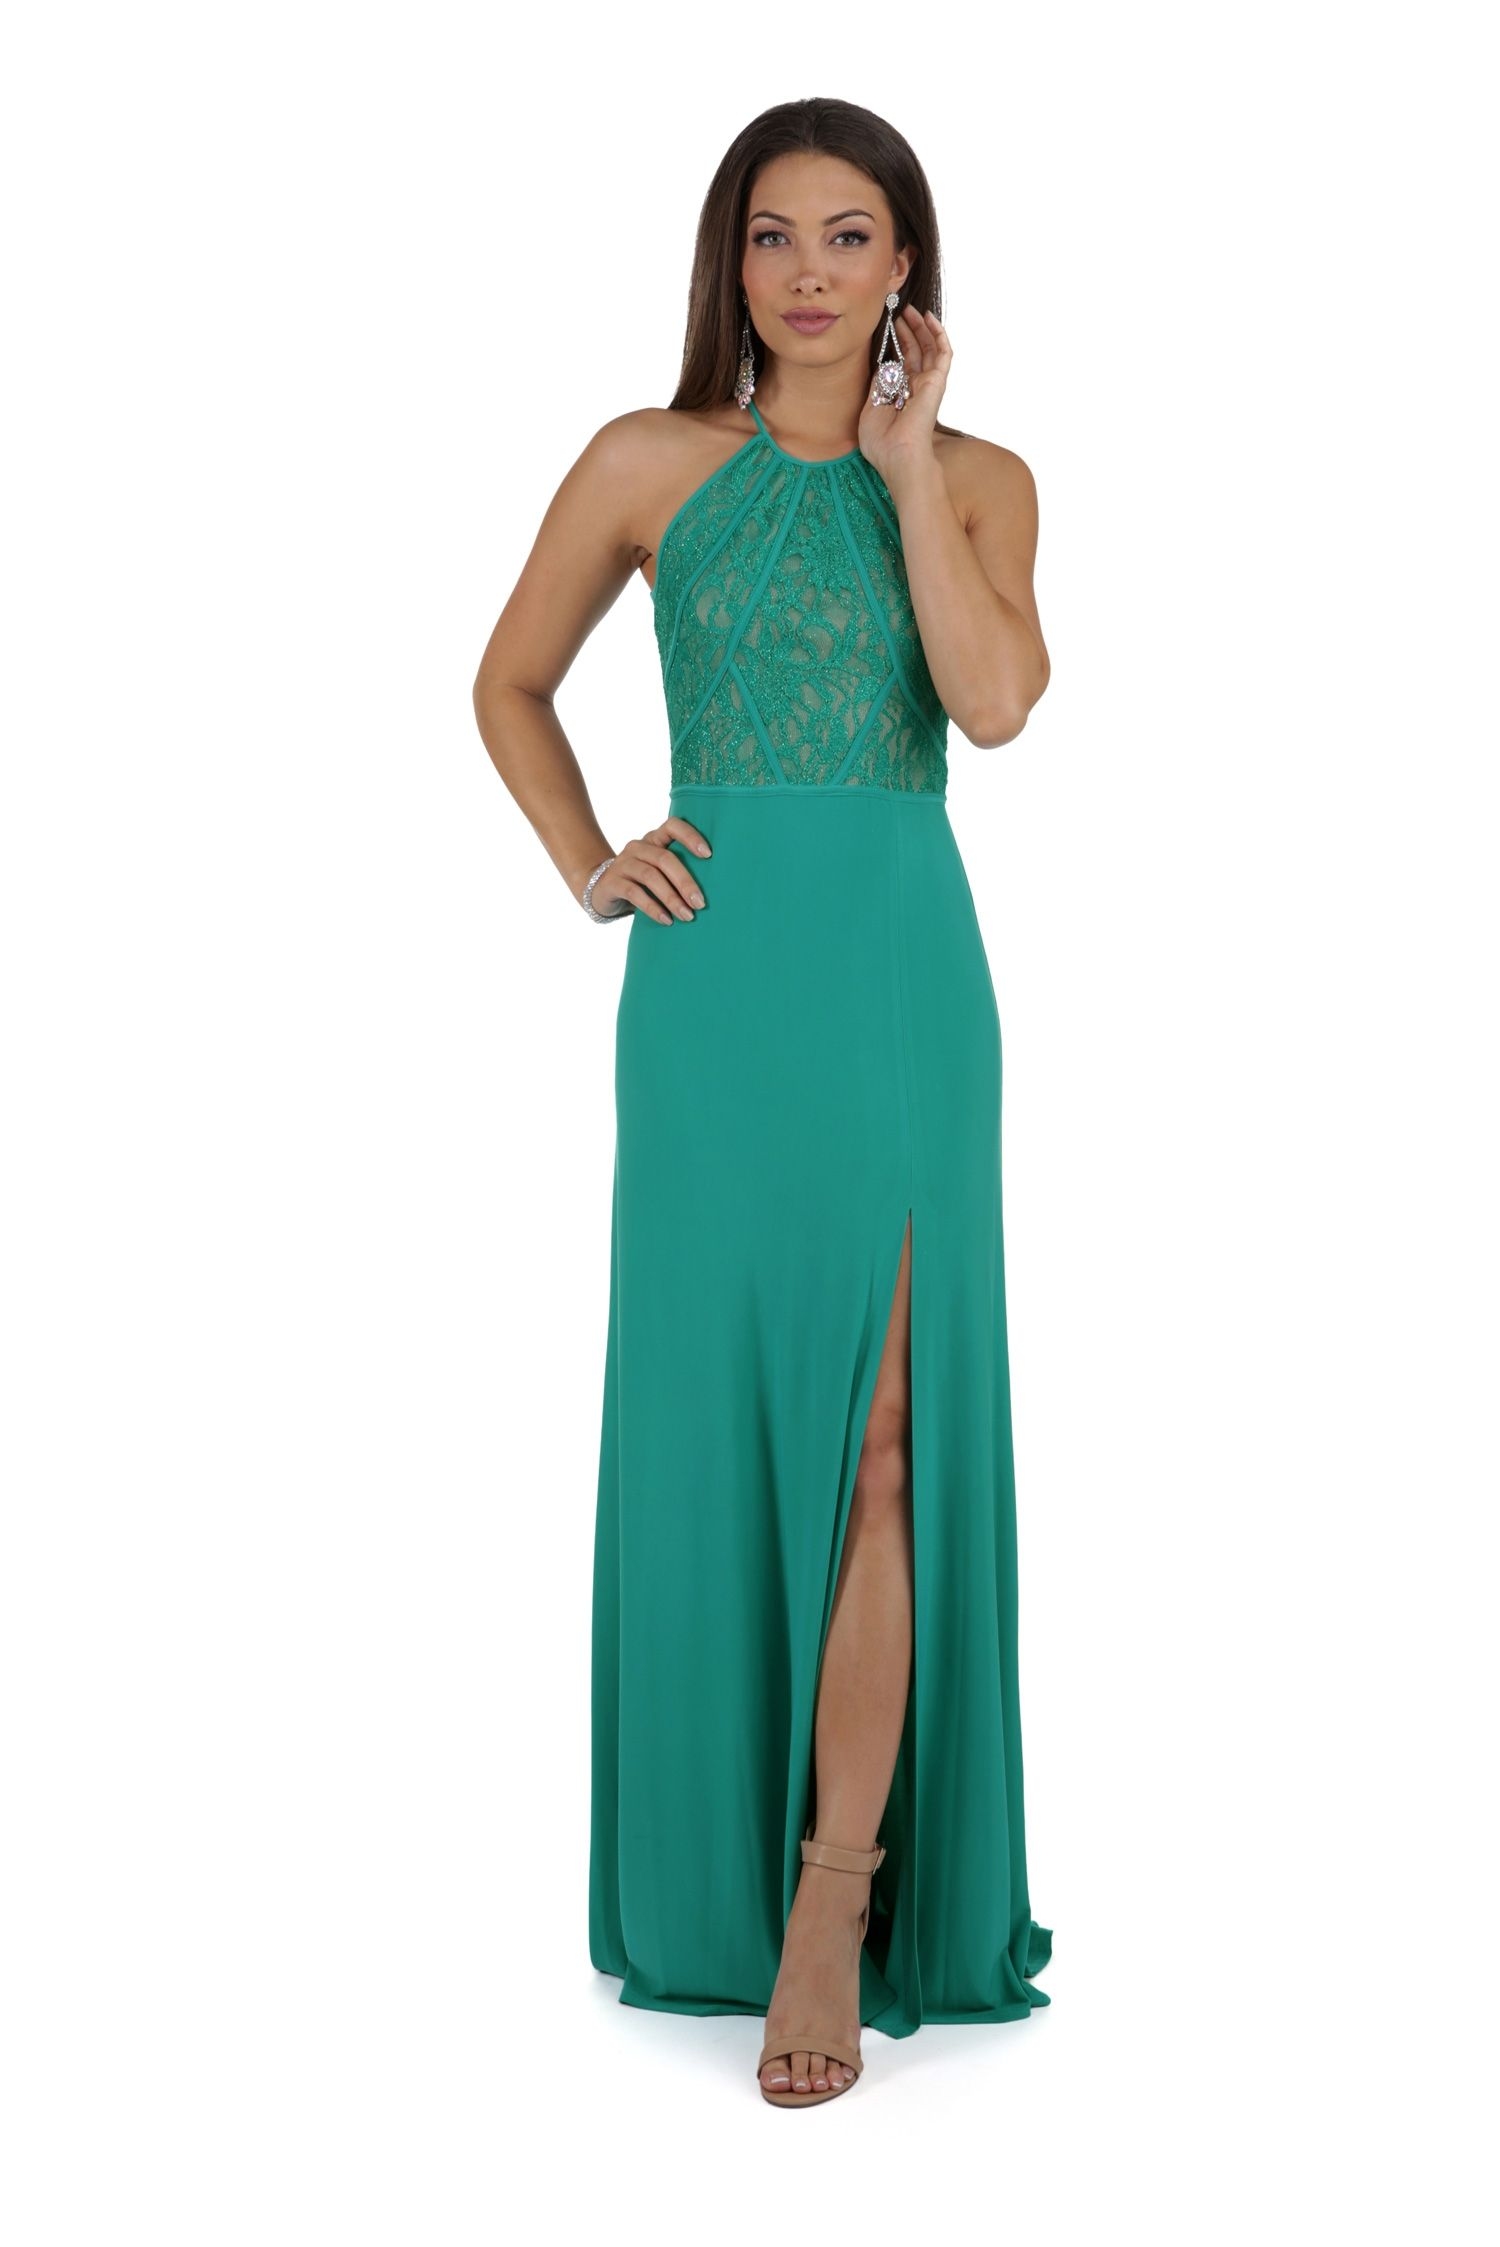 Jade Green Glitter Prom Dress | windsor | Dresses and formals ...